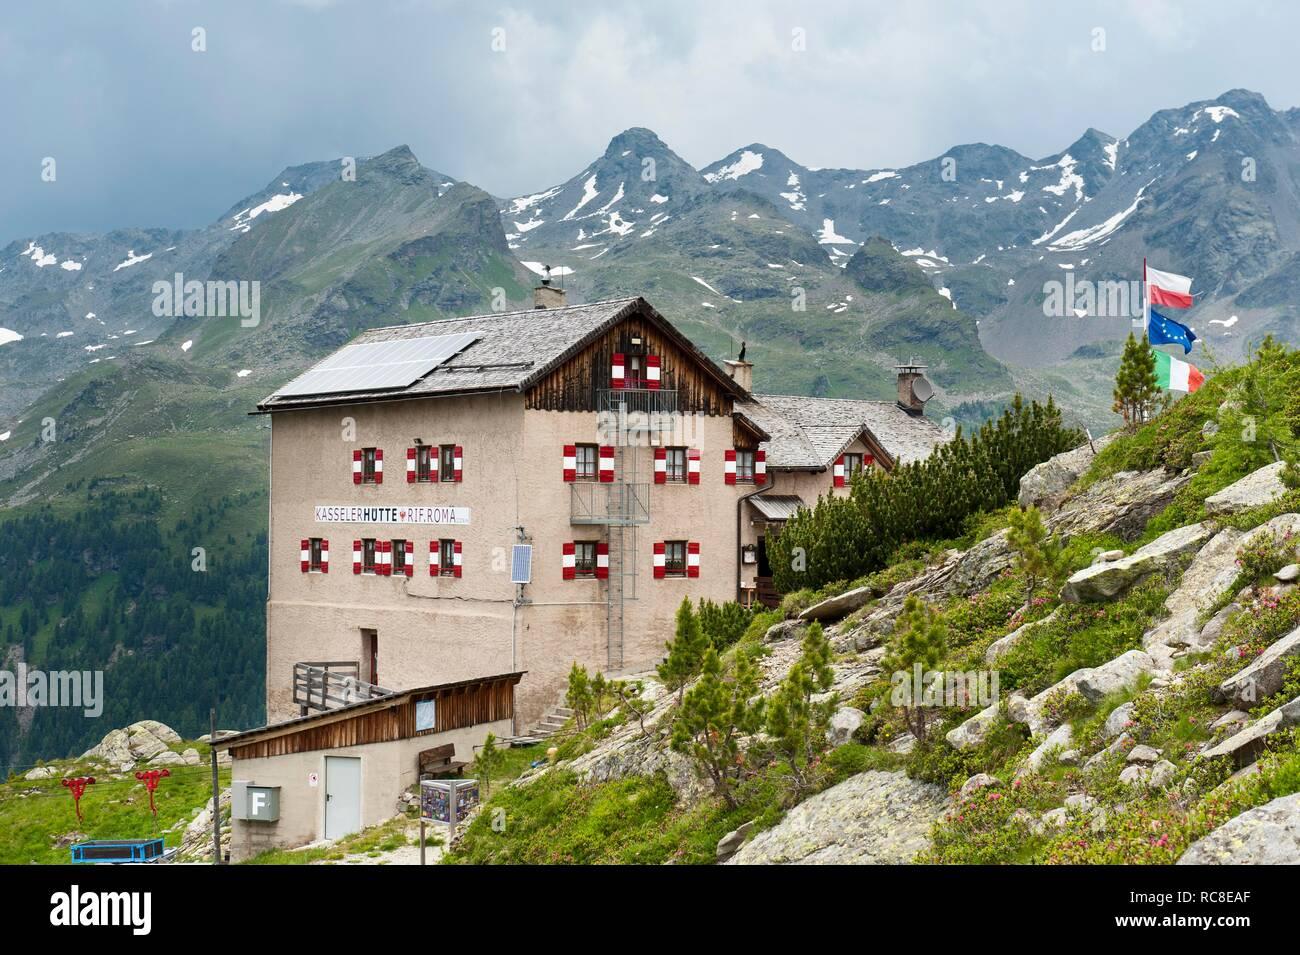 Mountain hut, Kassel hut, Rifugio Roma alla Vedrette di Ries, Rieserferner group, near Rein in Taufers, Riva di Tures, Pustertal - Stock Image